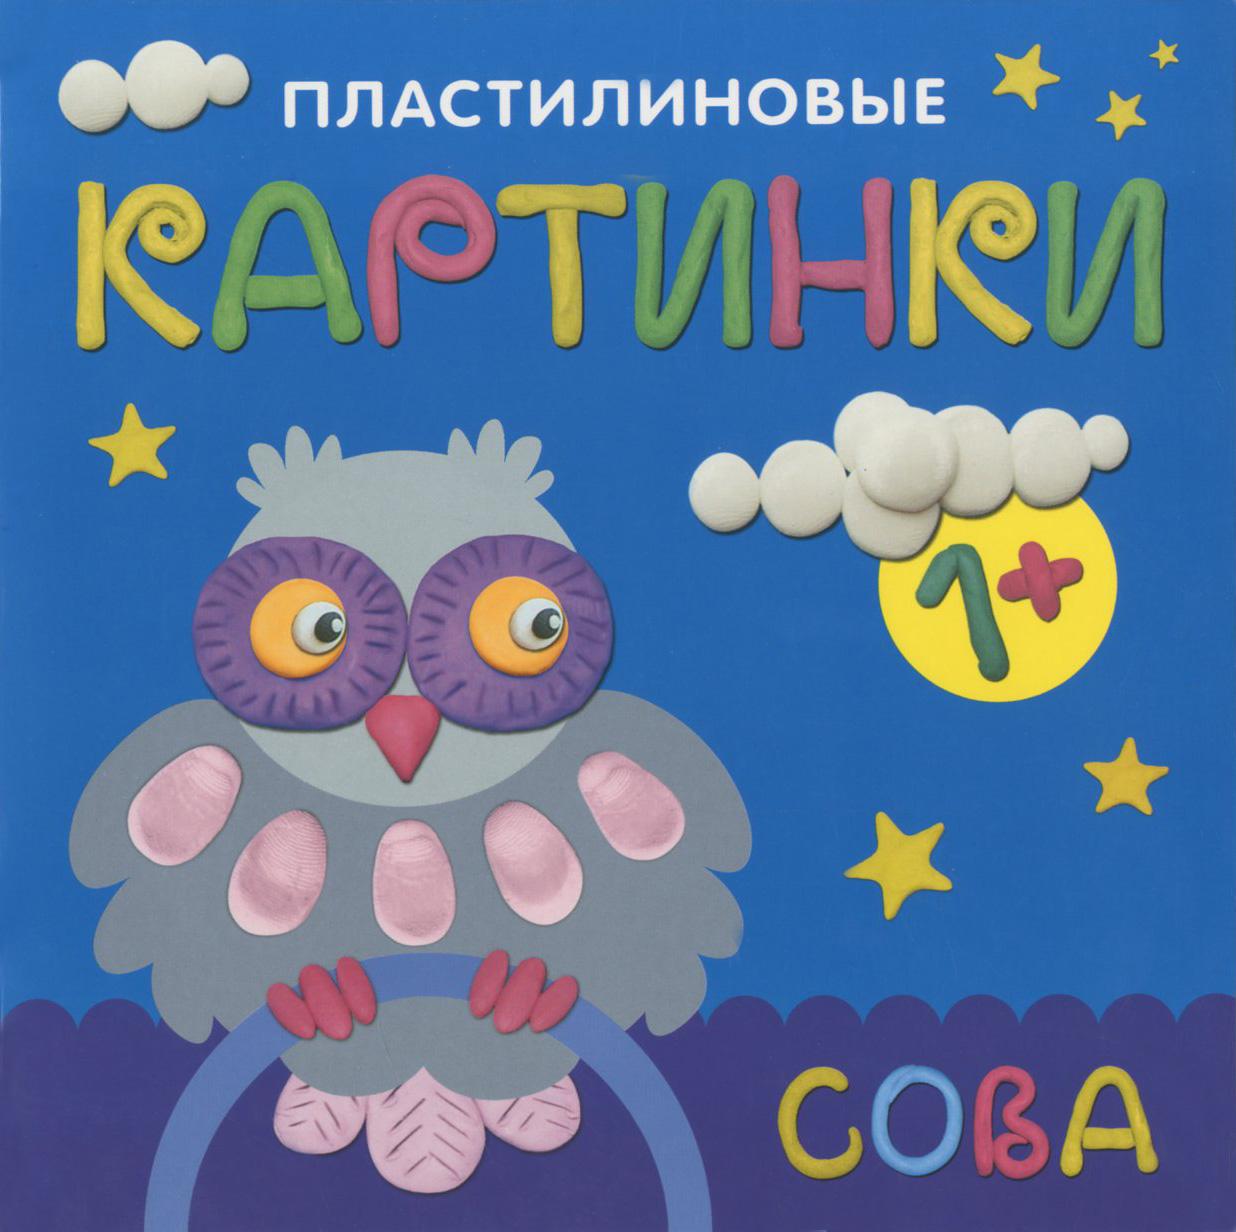 Пластилиновые картинки. Сова, Л. Бурмистрова, В. Мороз